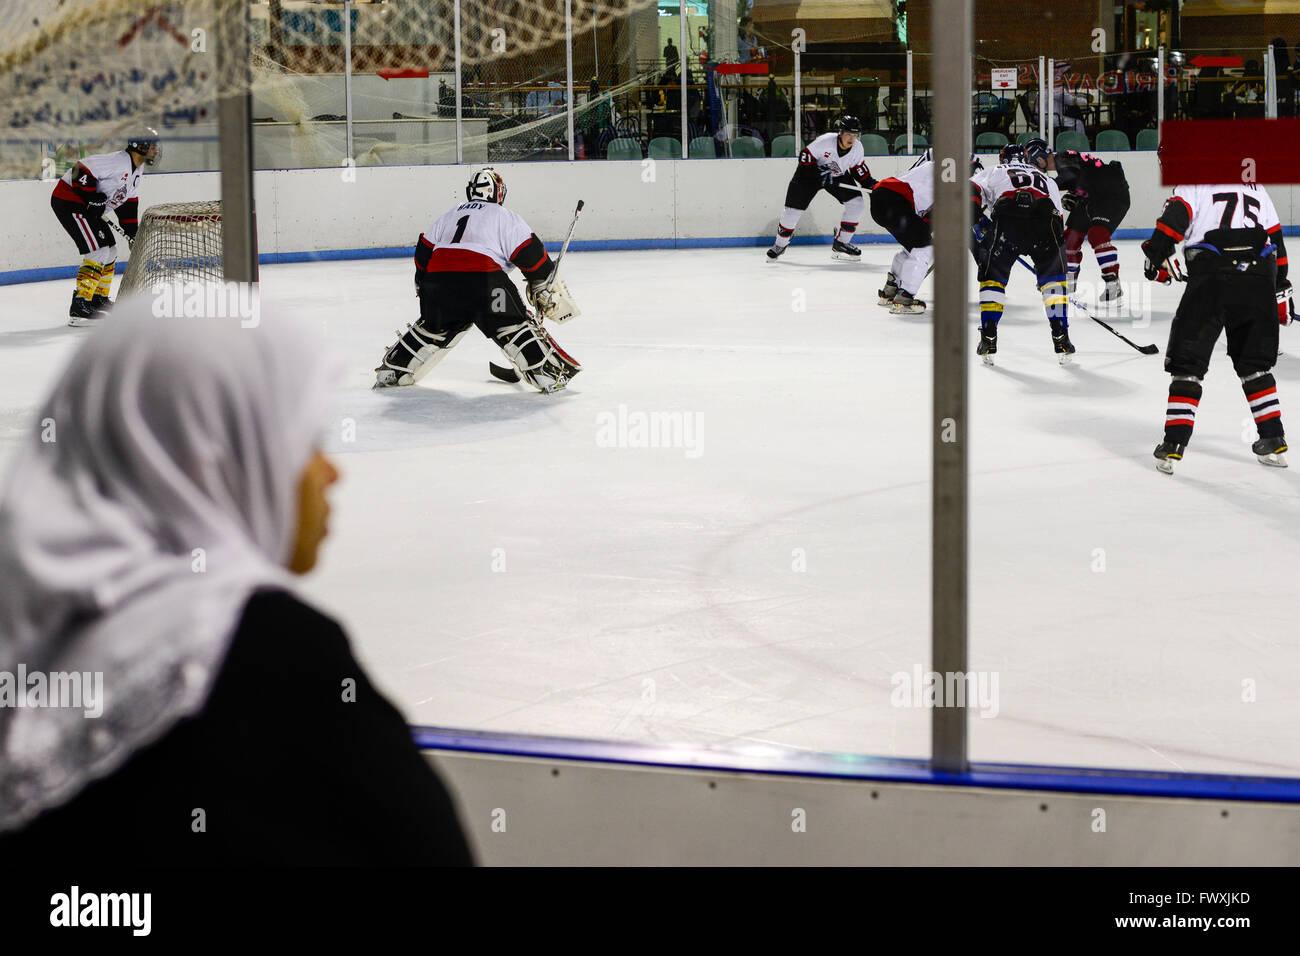 QATAR, Doha, Aspire Zone, Villaggio Mall centre commercial avec le patinage sur glace, hockey sur glace jeu / KATAR, Photo Stock